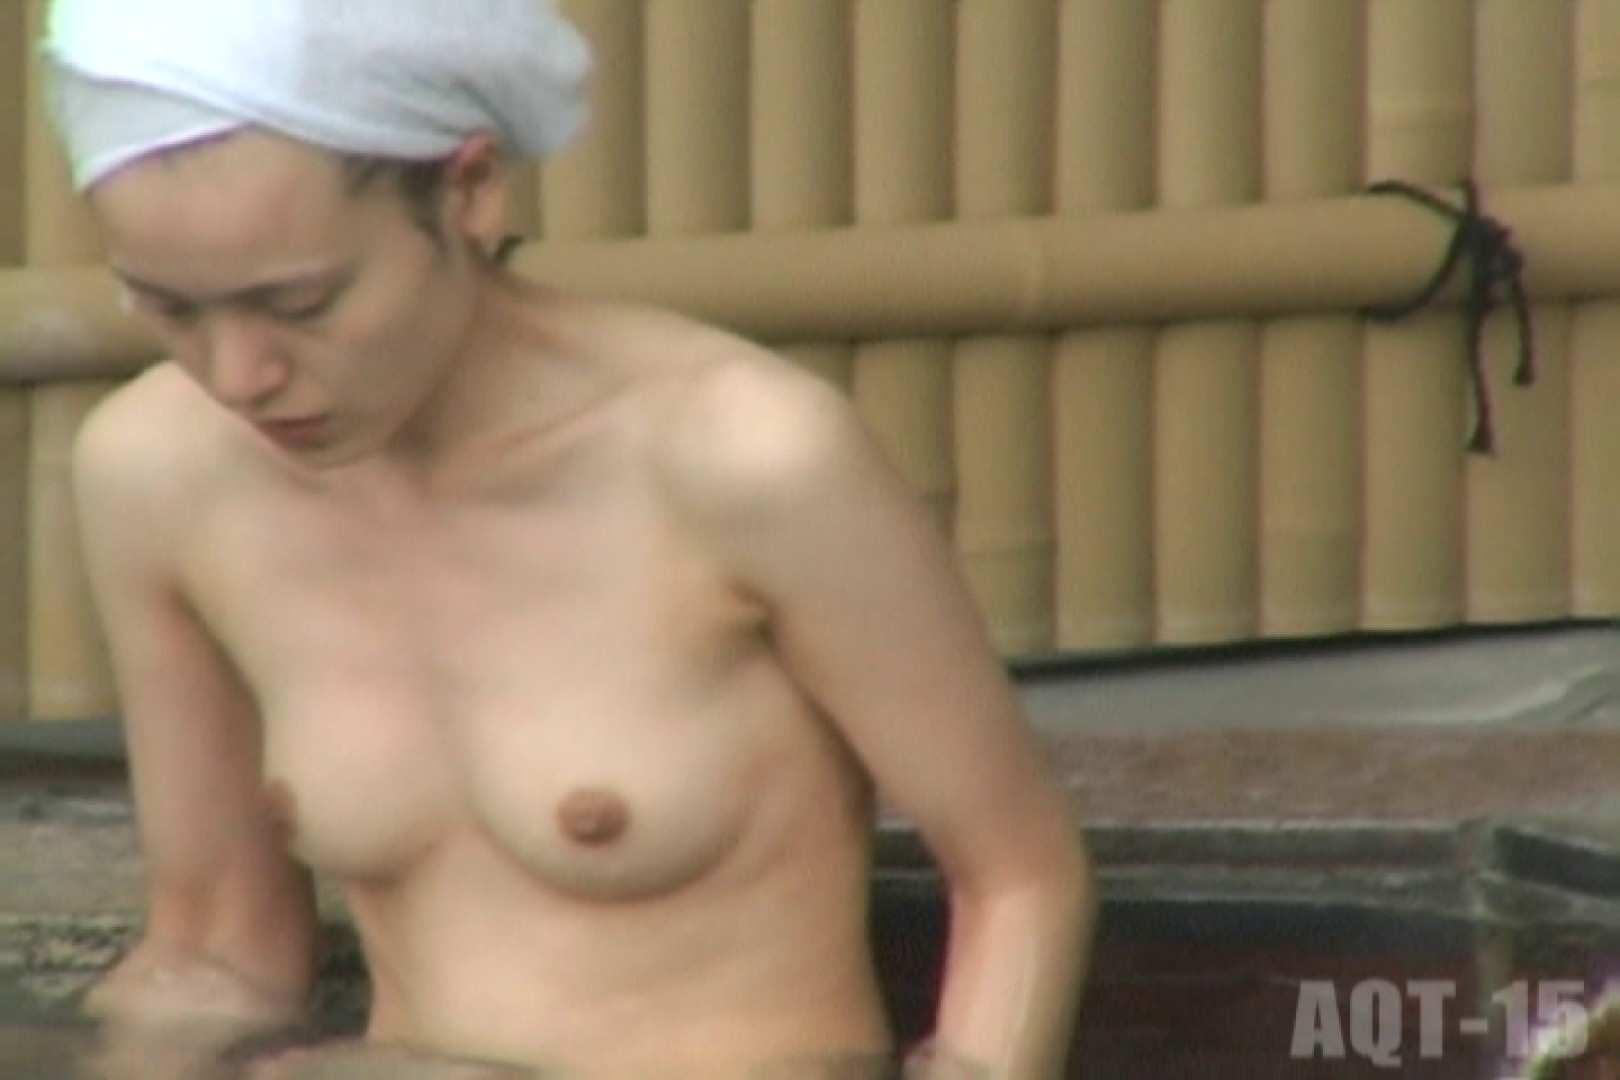 Aquaな露天風呂Vol.836 女体盗撮 盗撮アダルト動画キャプチャ 98連発 50